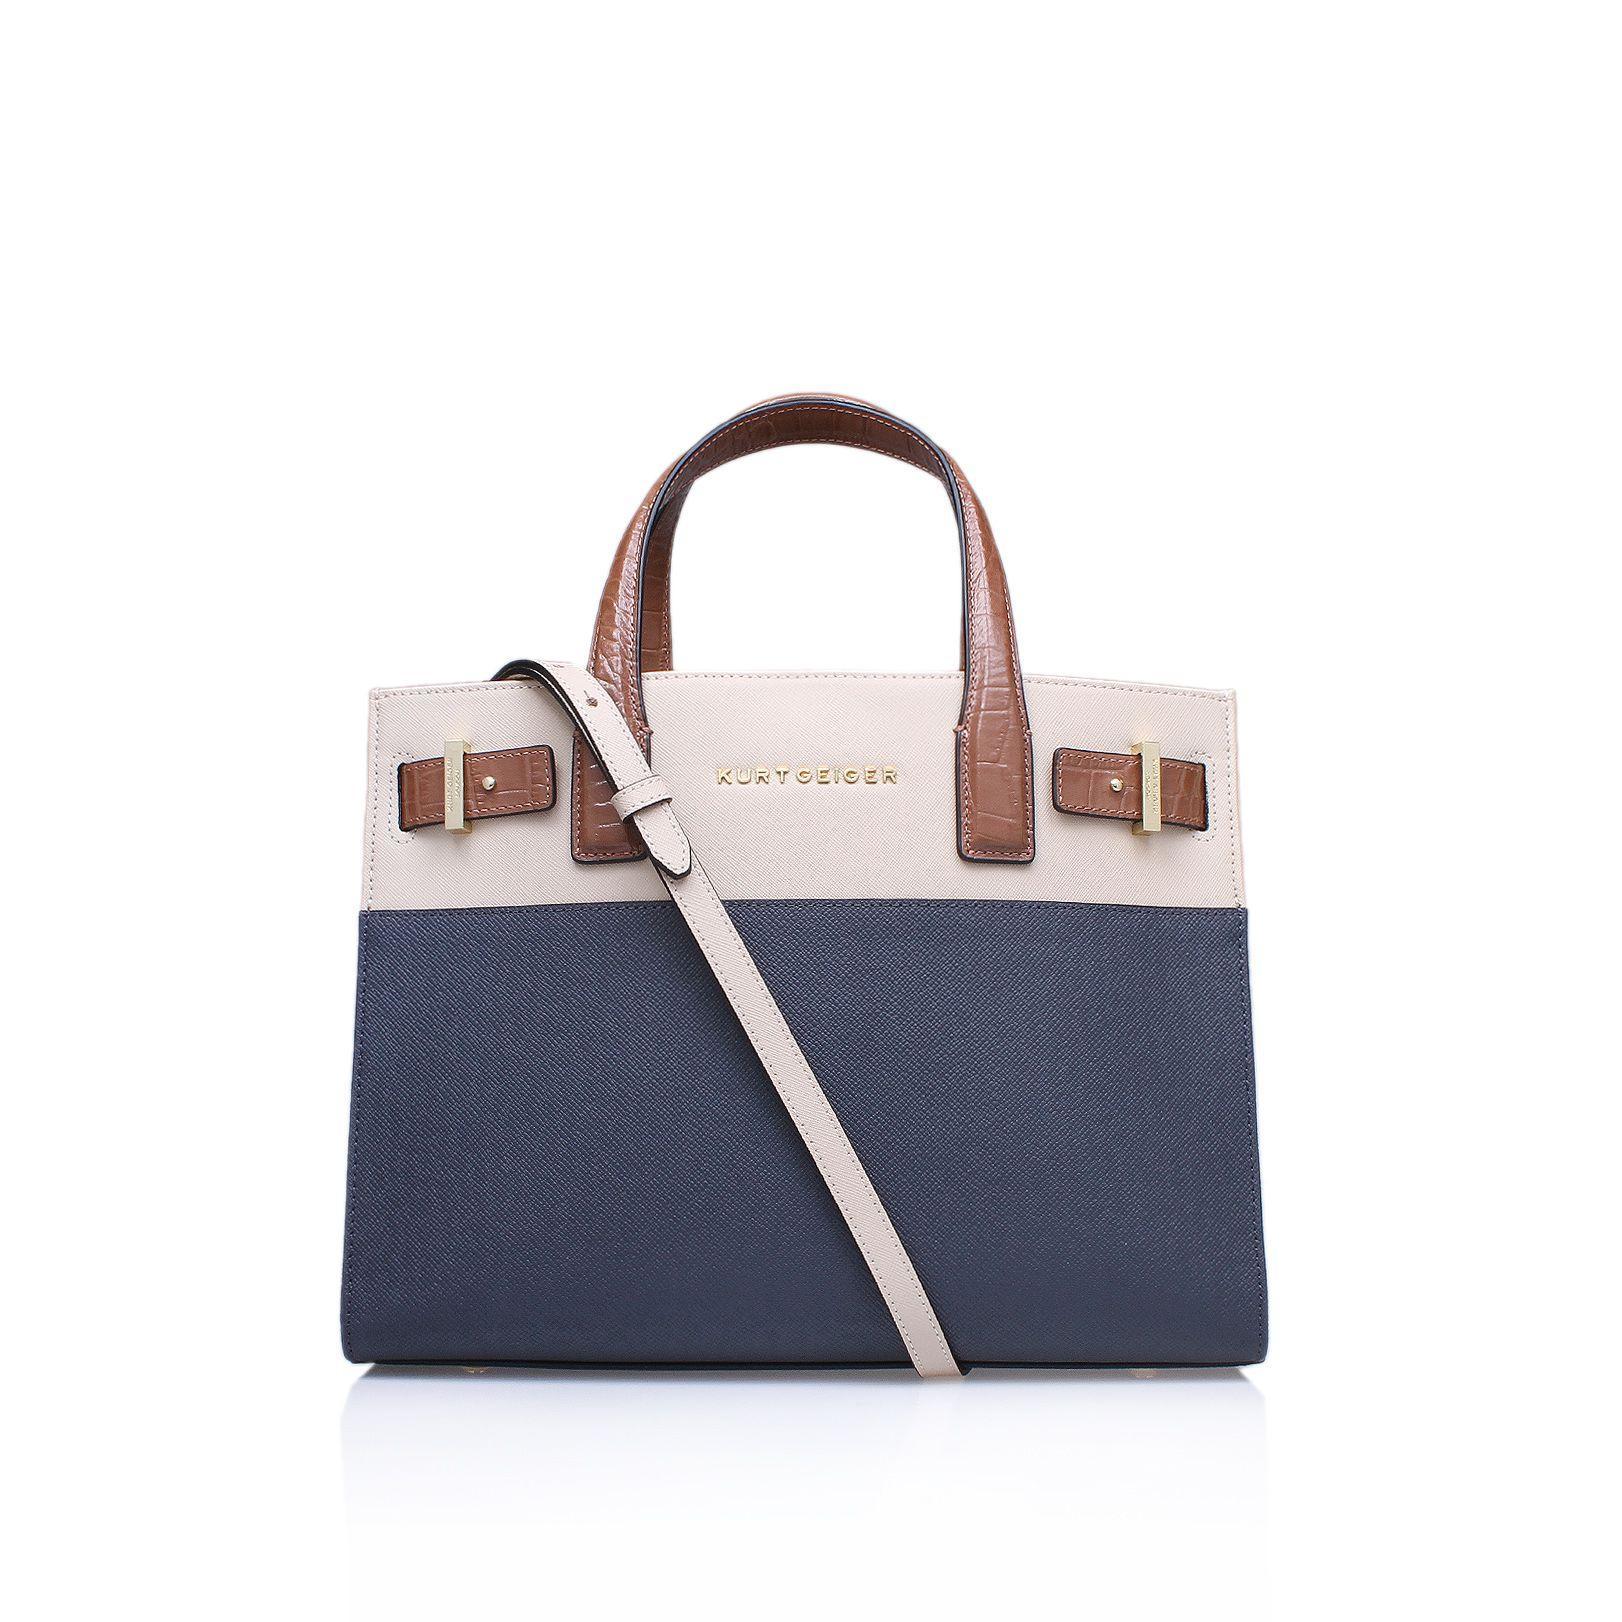 Kurt geiger new saffiano london tote handbag in blue lyst for Housse of fraser